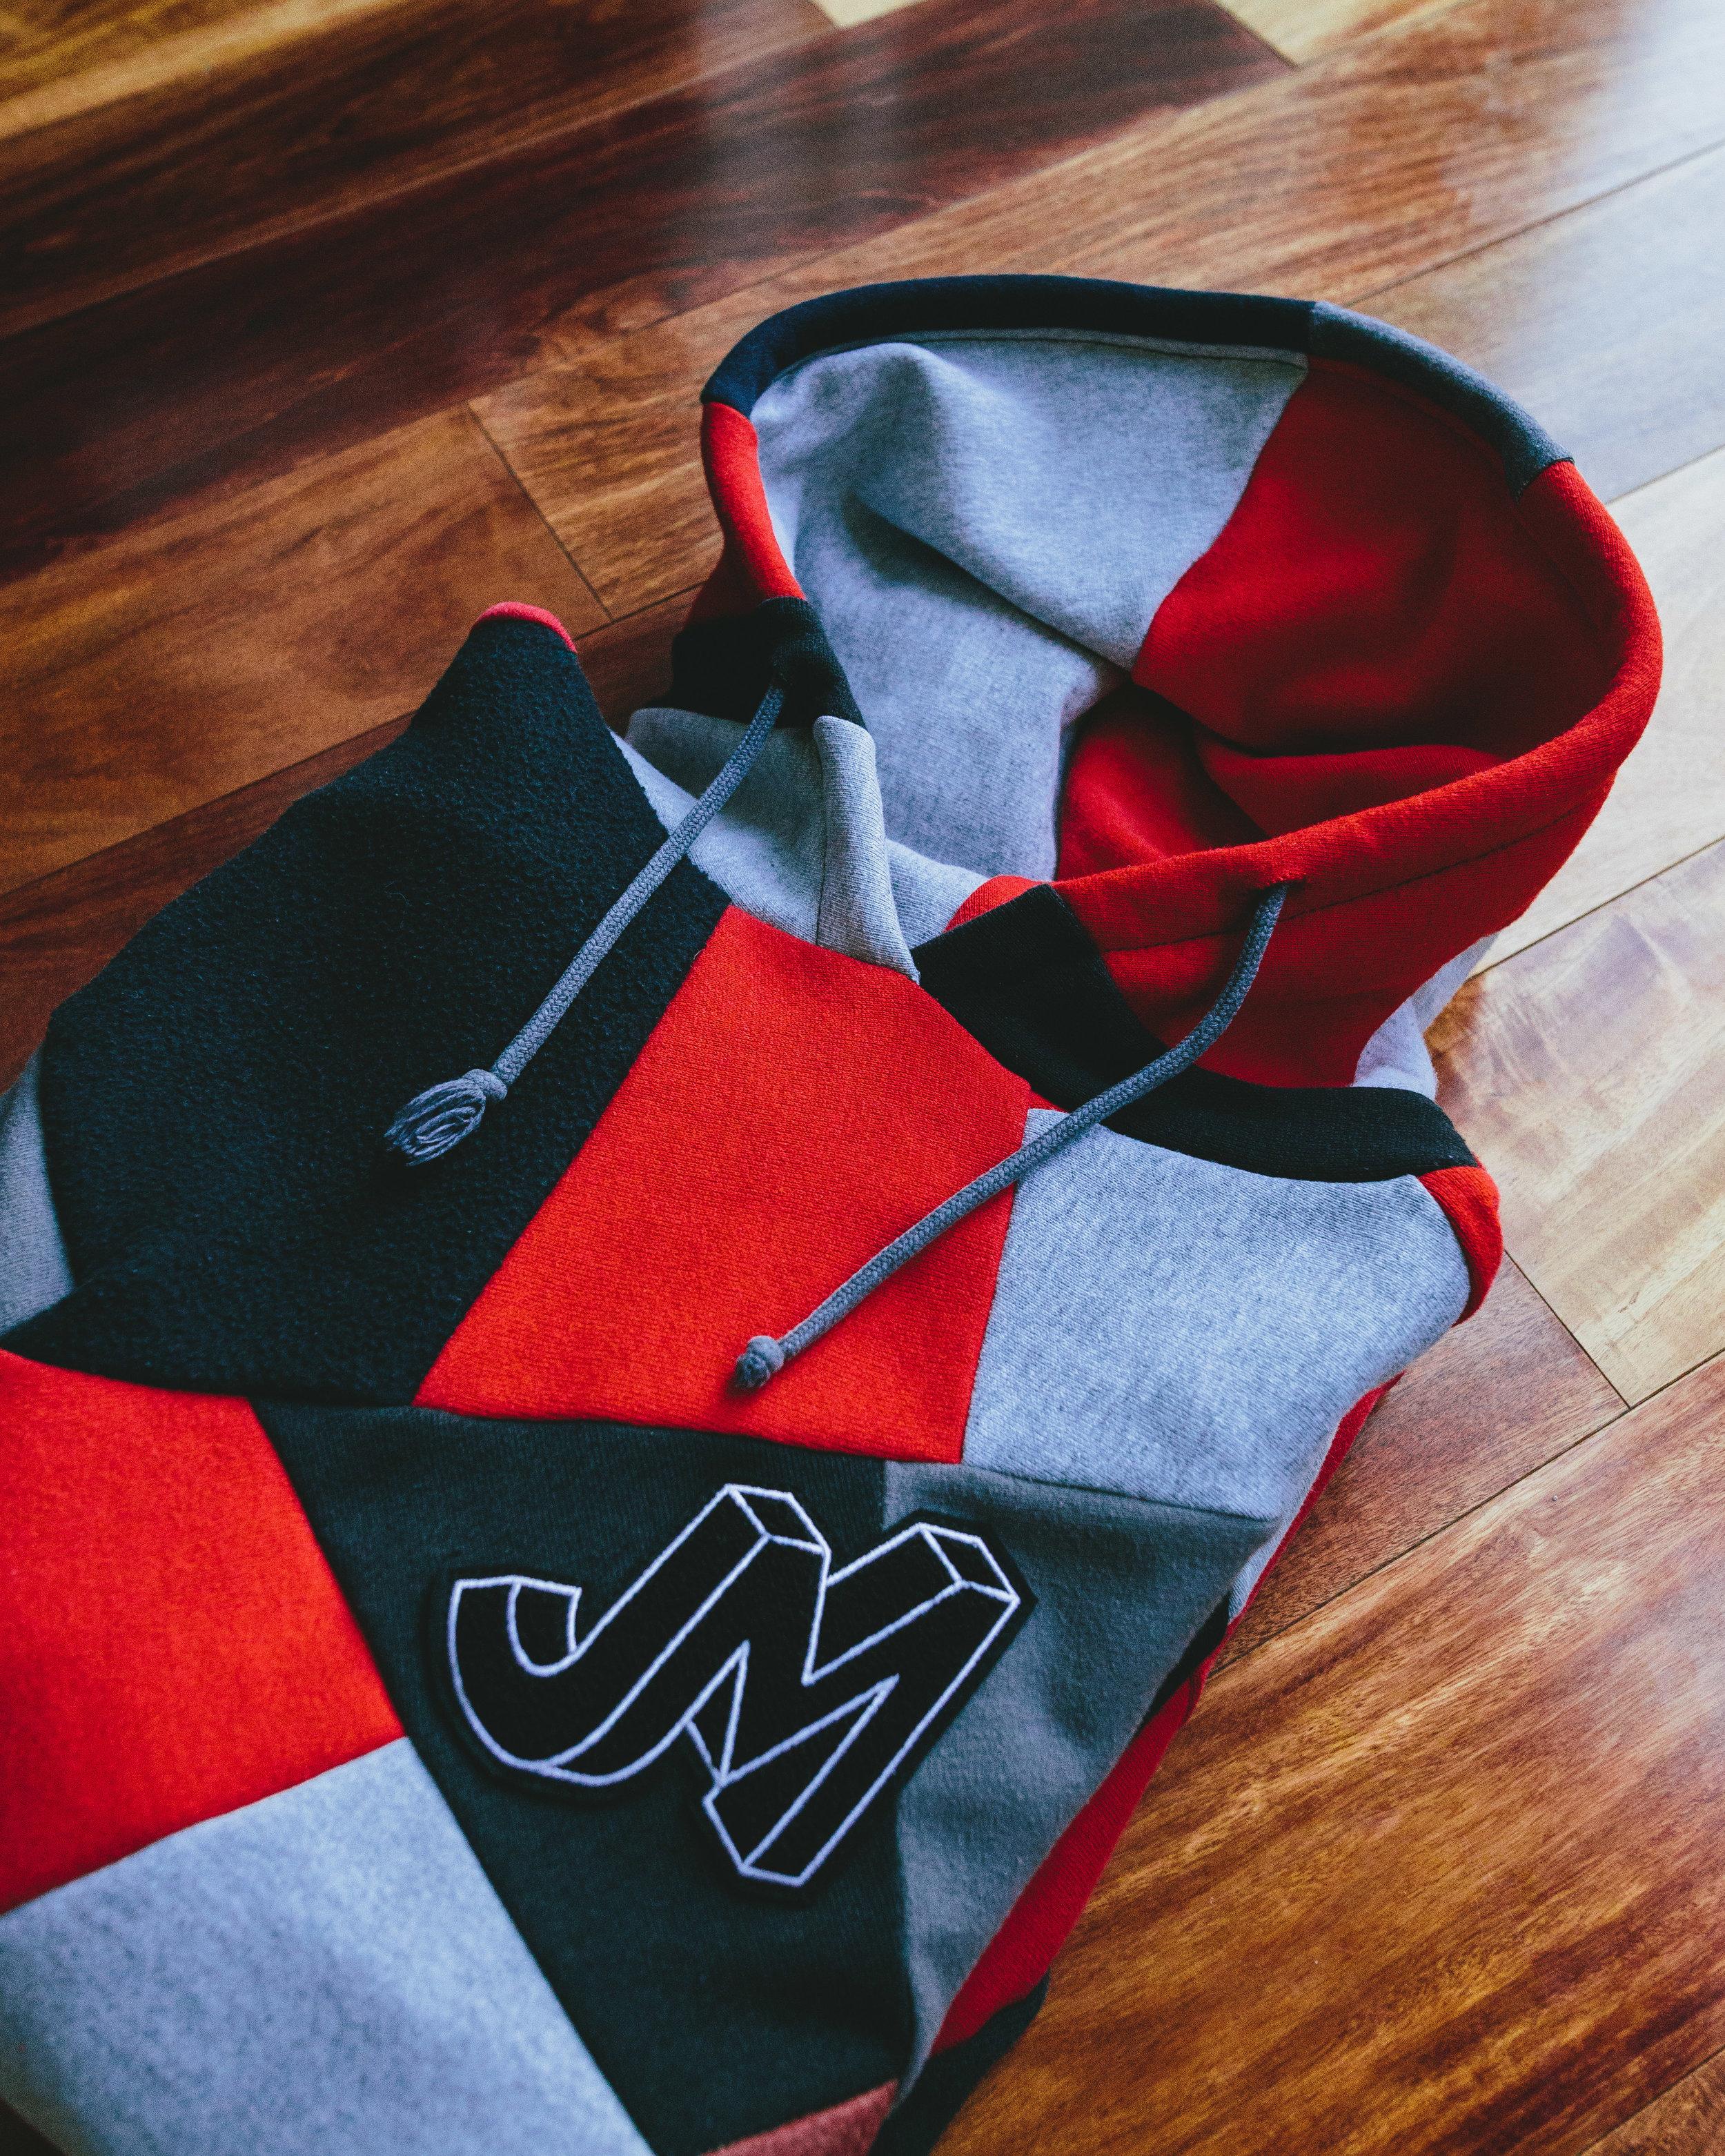 jmsweater-1009.jpg